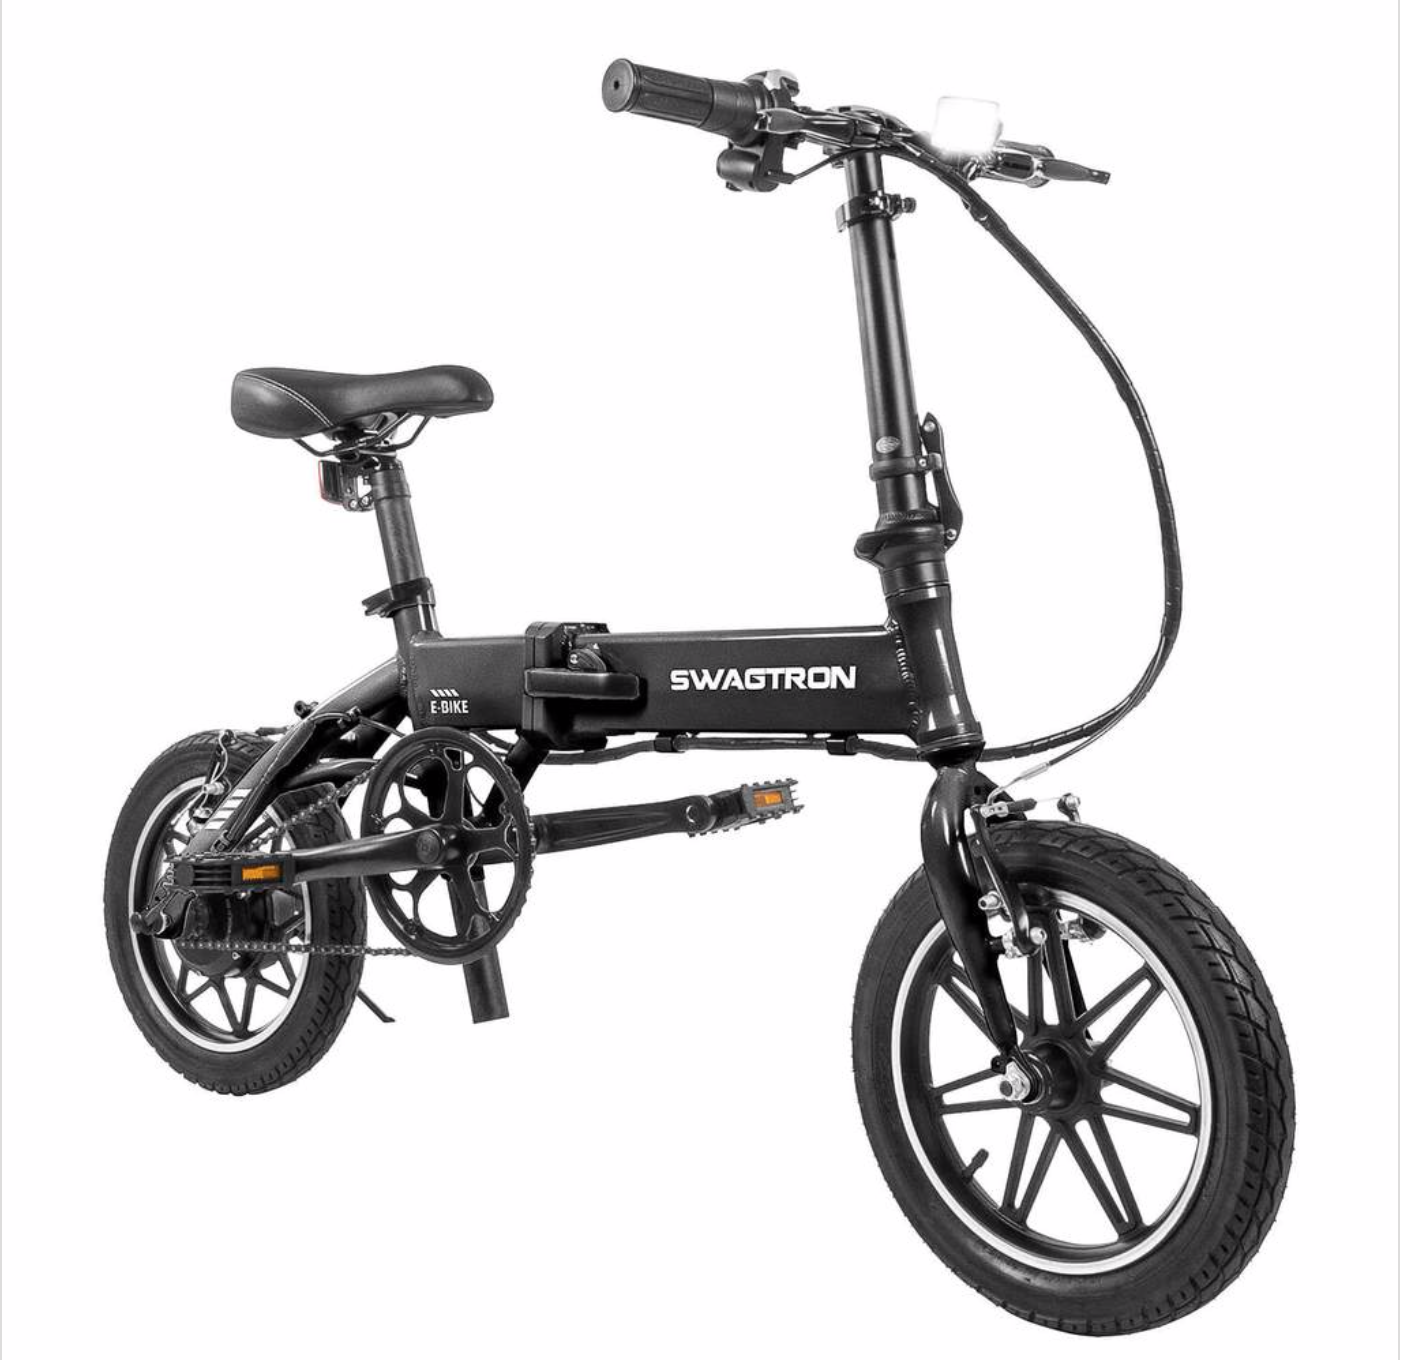 Swagtron Eb5 Folding Electric Bike Folding Electric Bike